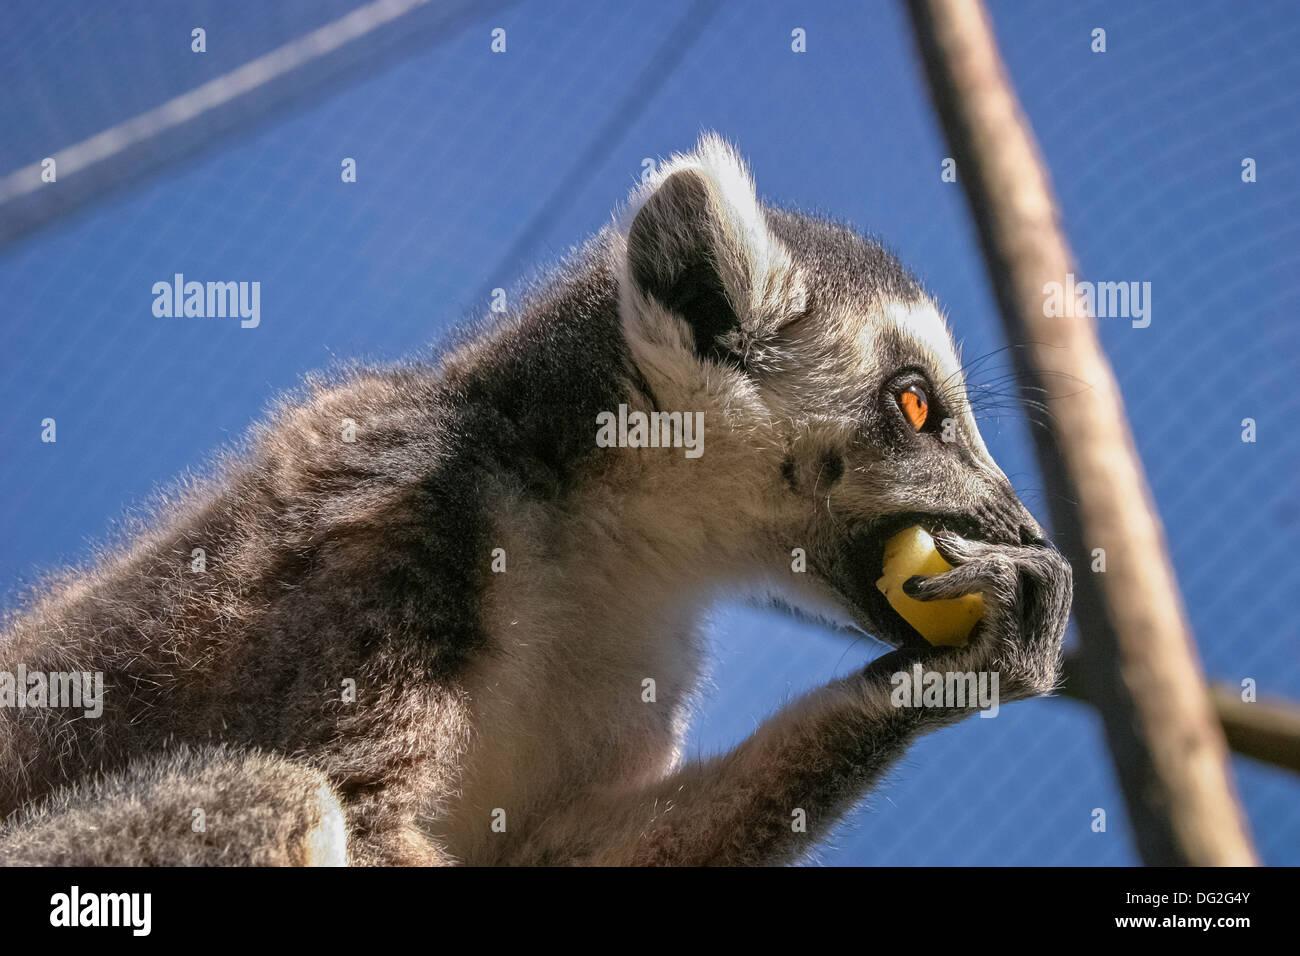 Captive Ring-tailed Lemur (Lemur catta) eating fruit, Marwell Zoo Stock Photo